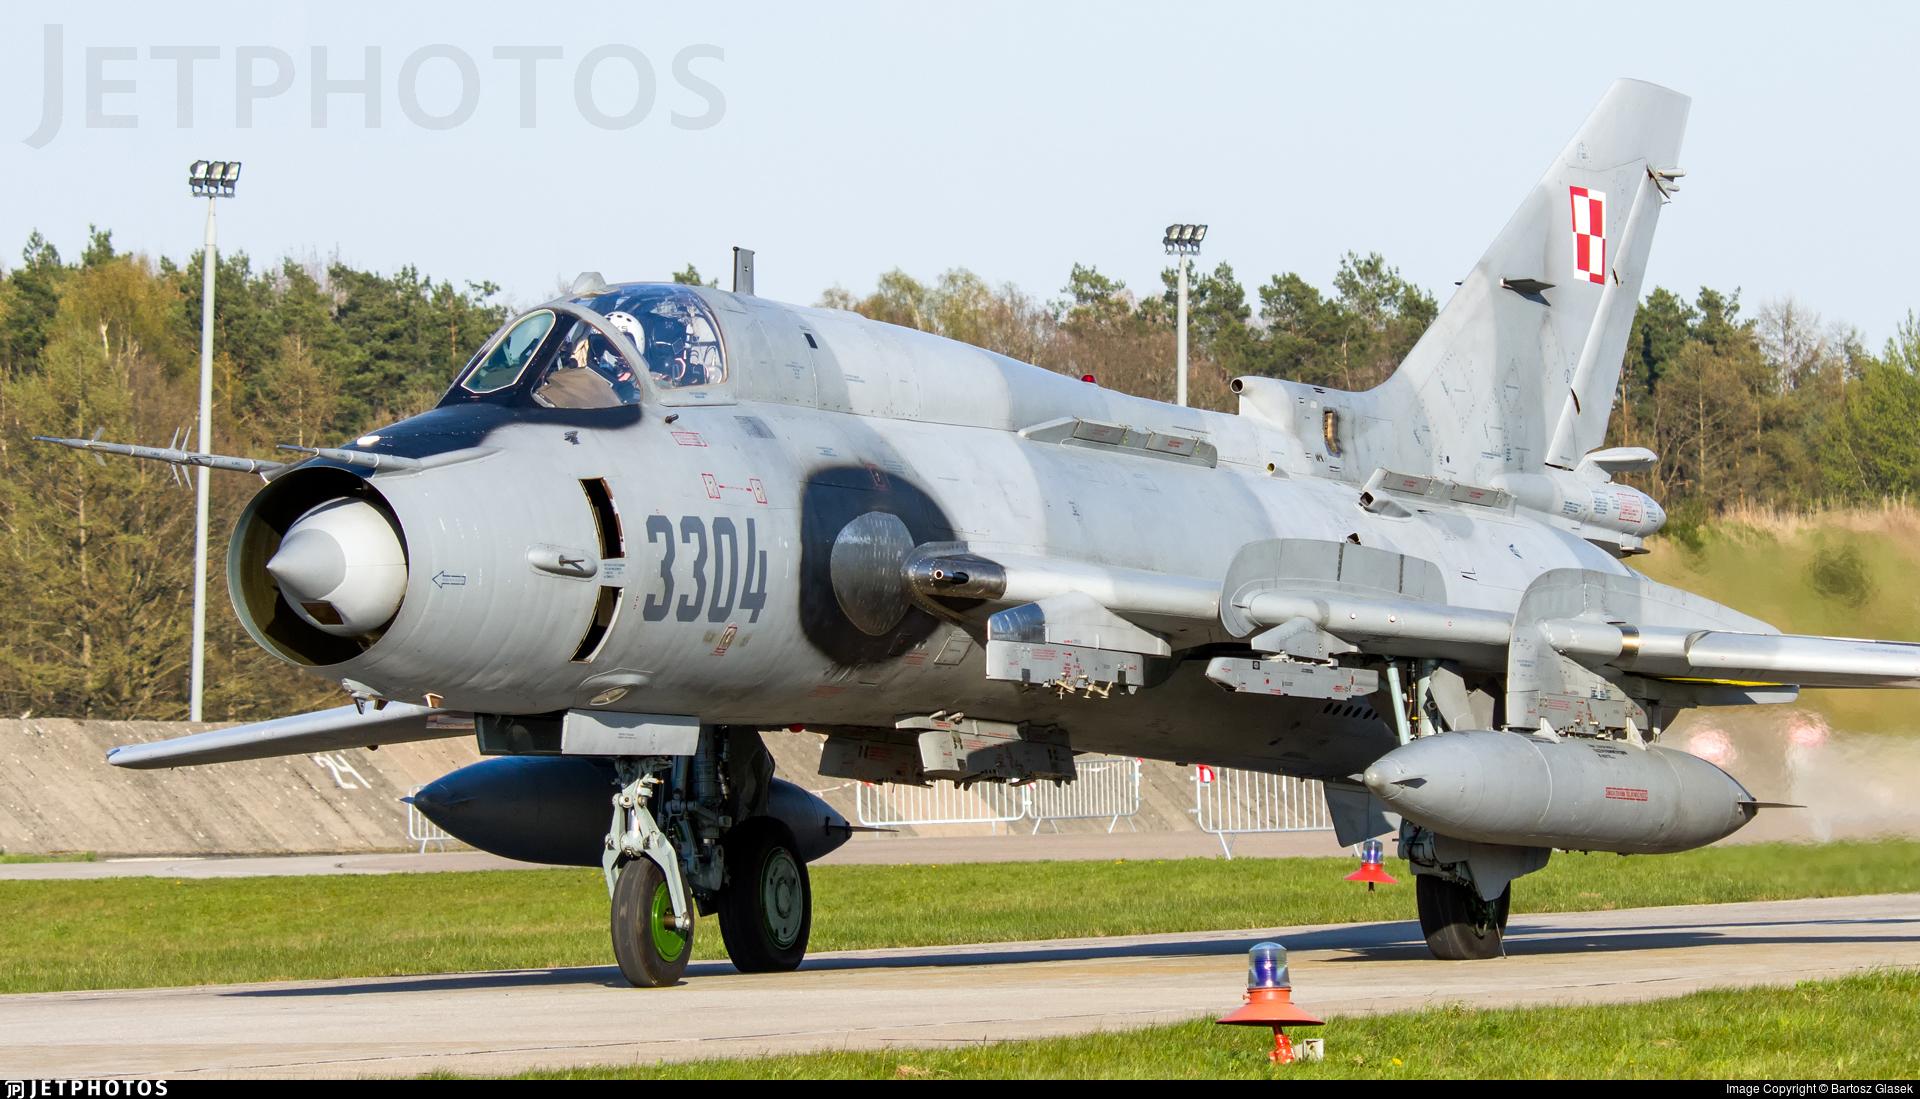 3304 - Sukhoi Su-22M4 Fitter K - Poland - Air Force